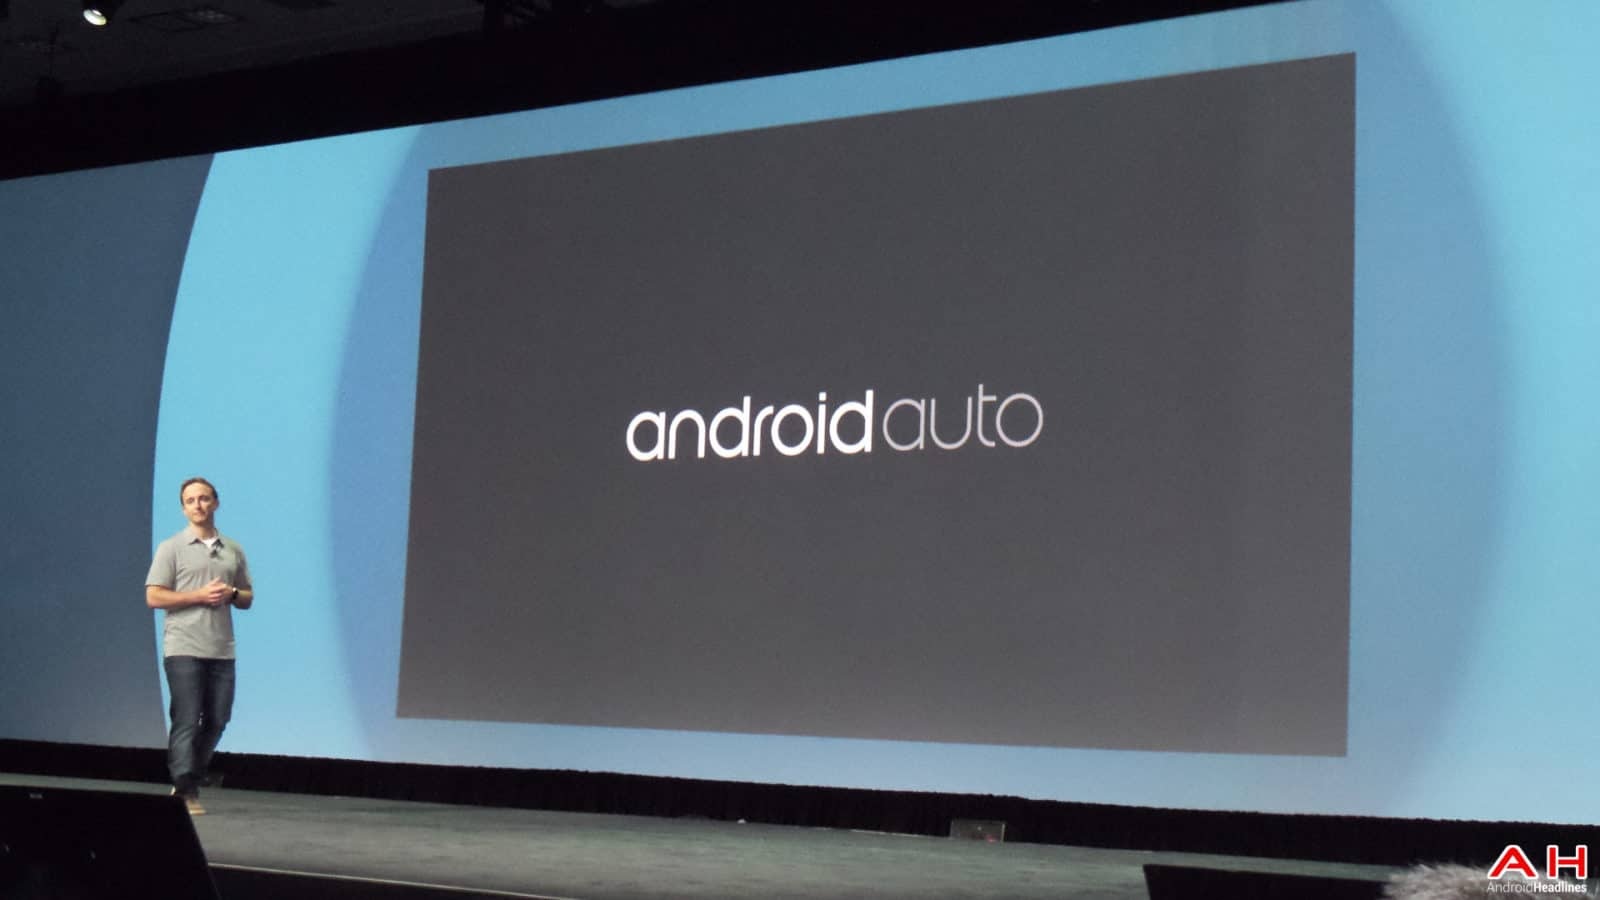 AH Google IO 2014 (311 of 18) Android Auto Logo